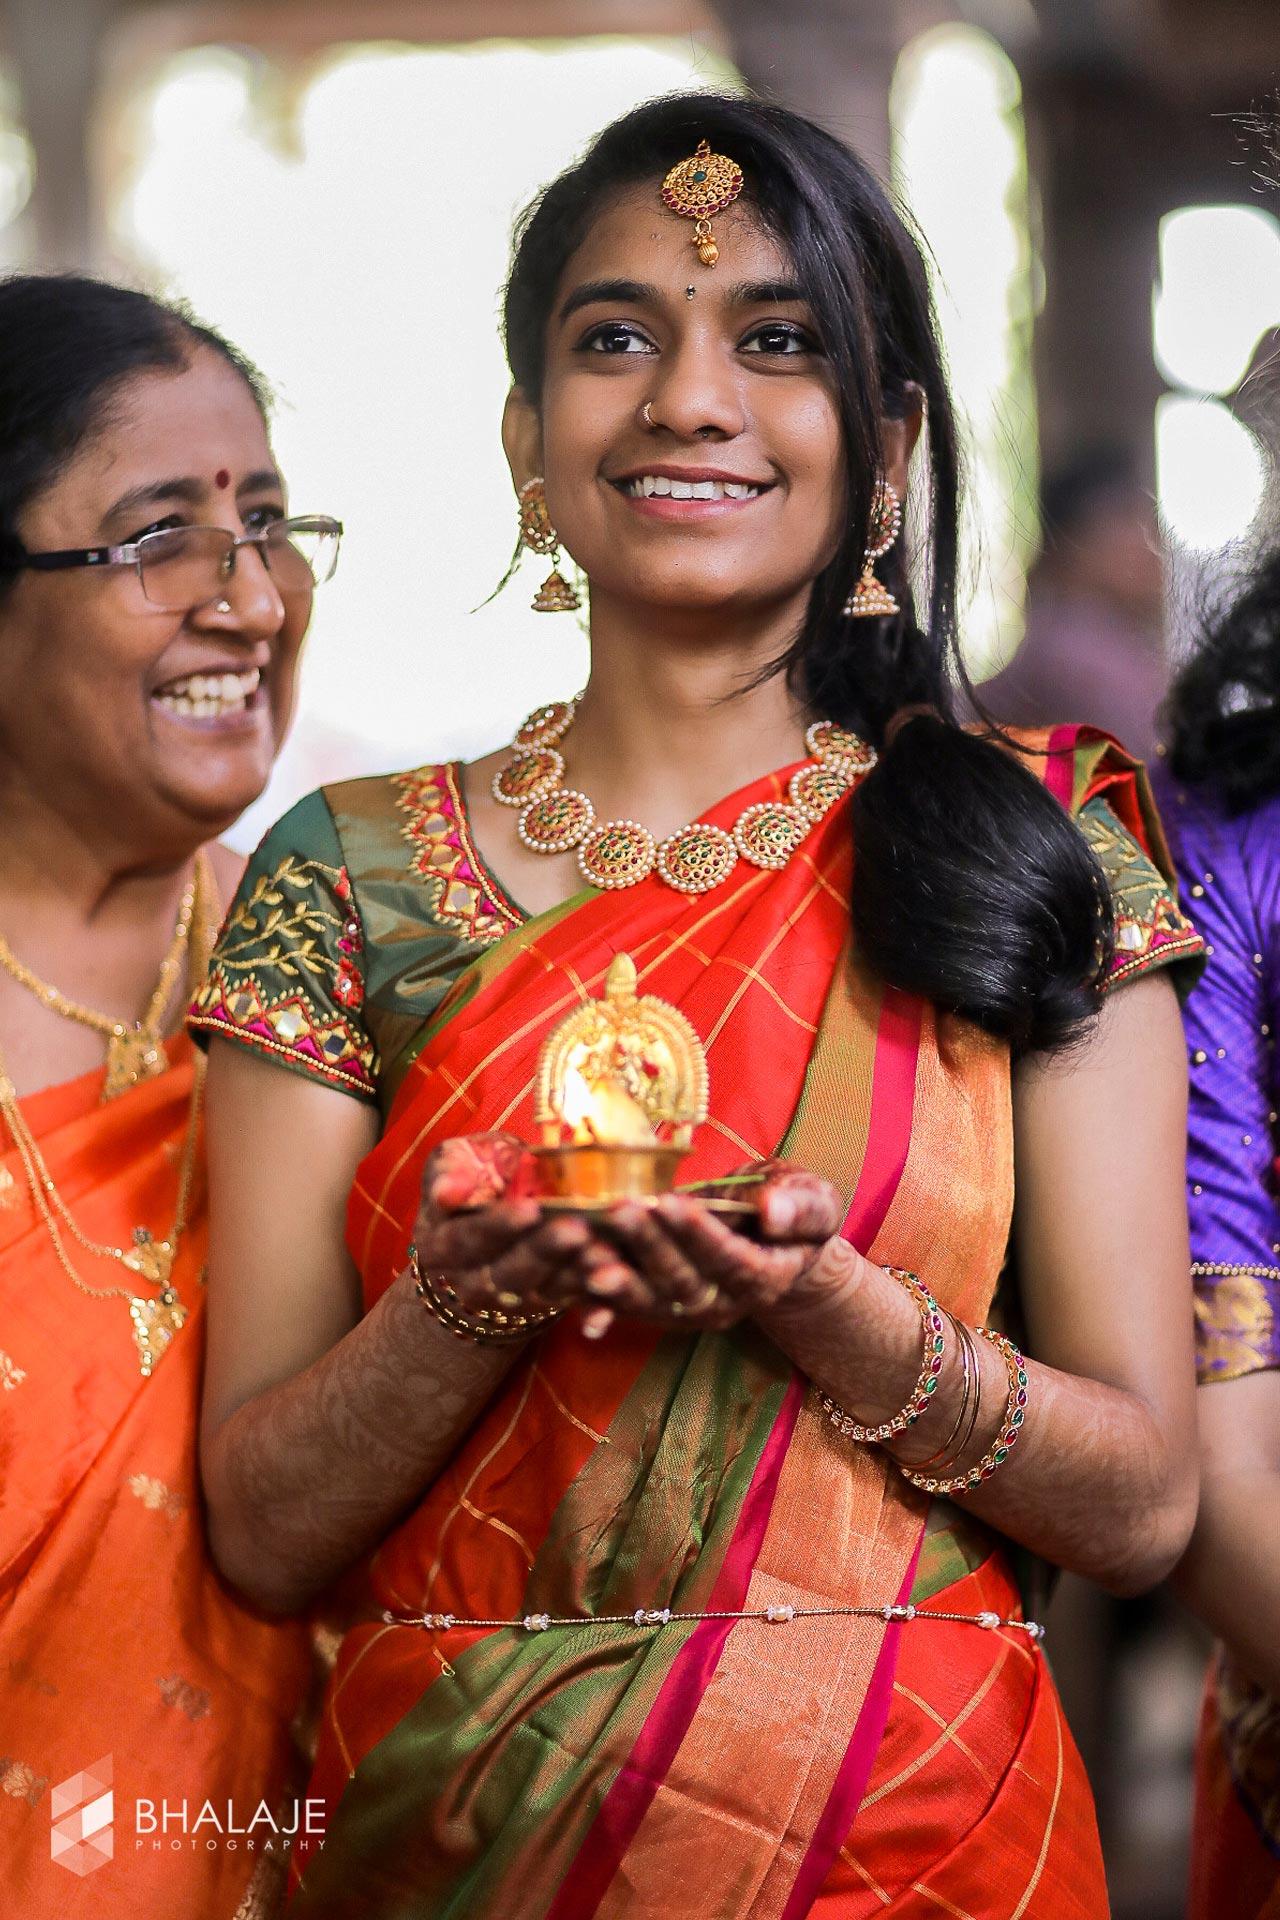 Christian Wedding Photography, Muslim Wedding photography, Professional Photography nearme, Candid photographers in Chennai,Wedding Photographer.